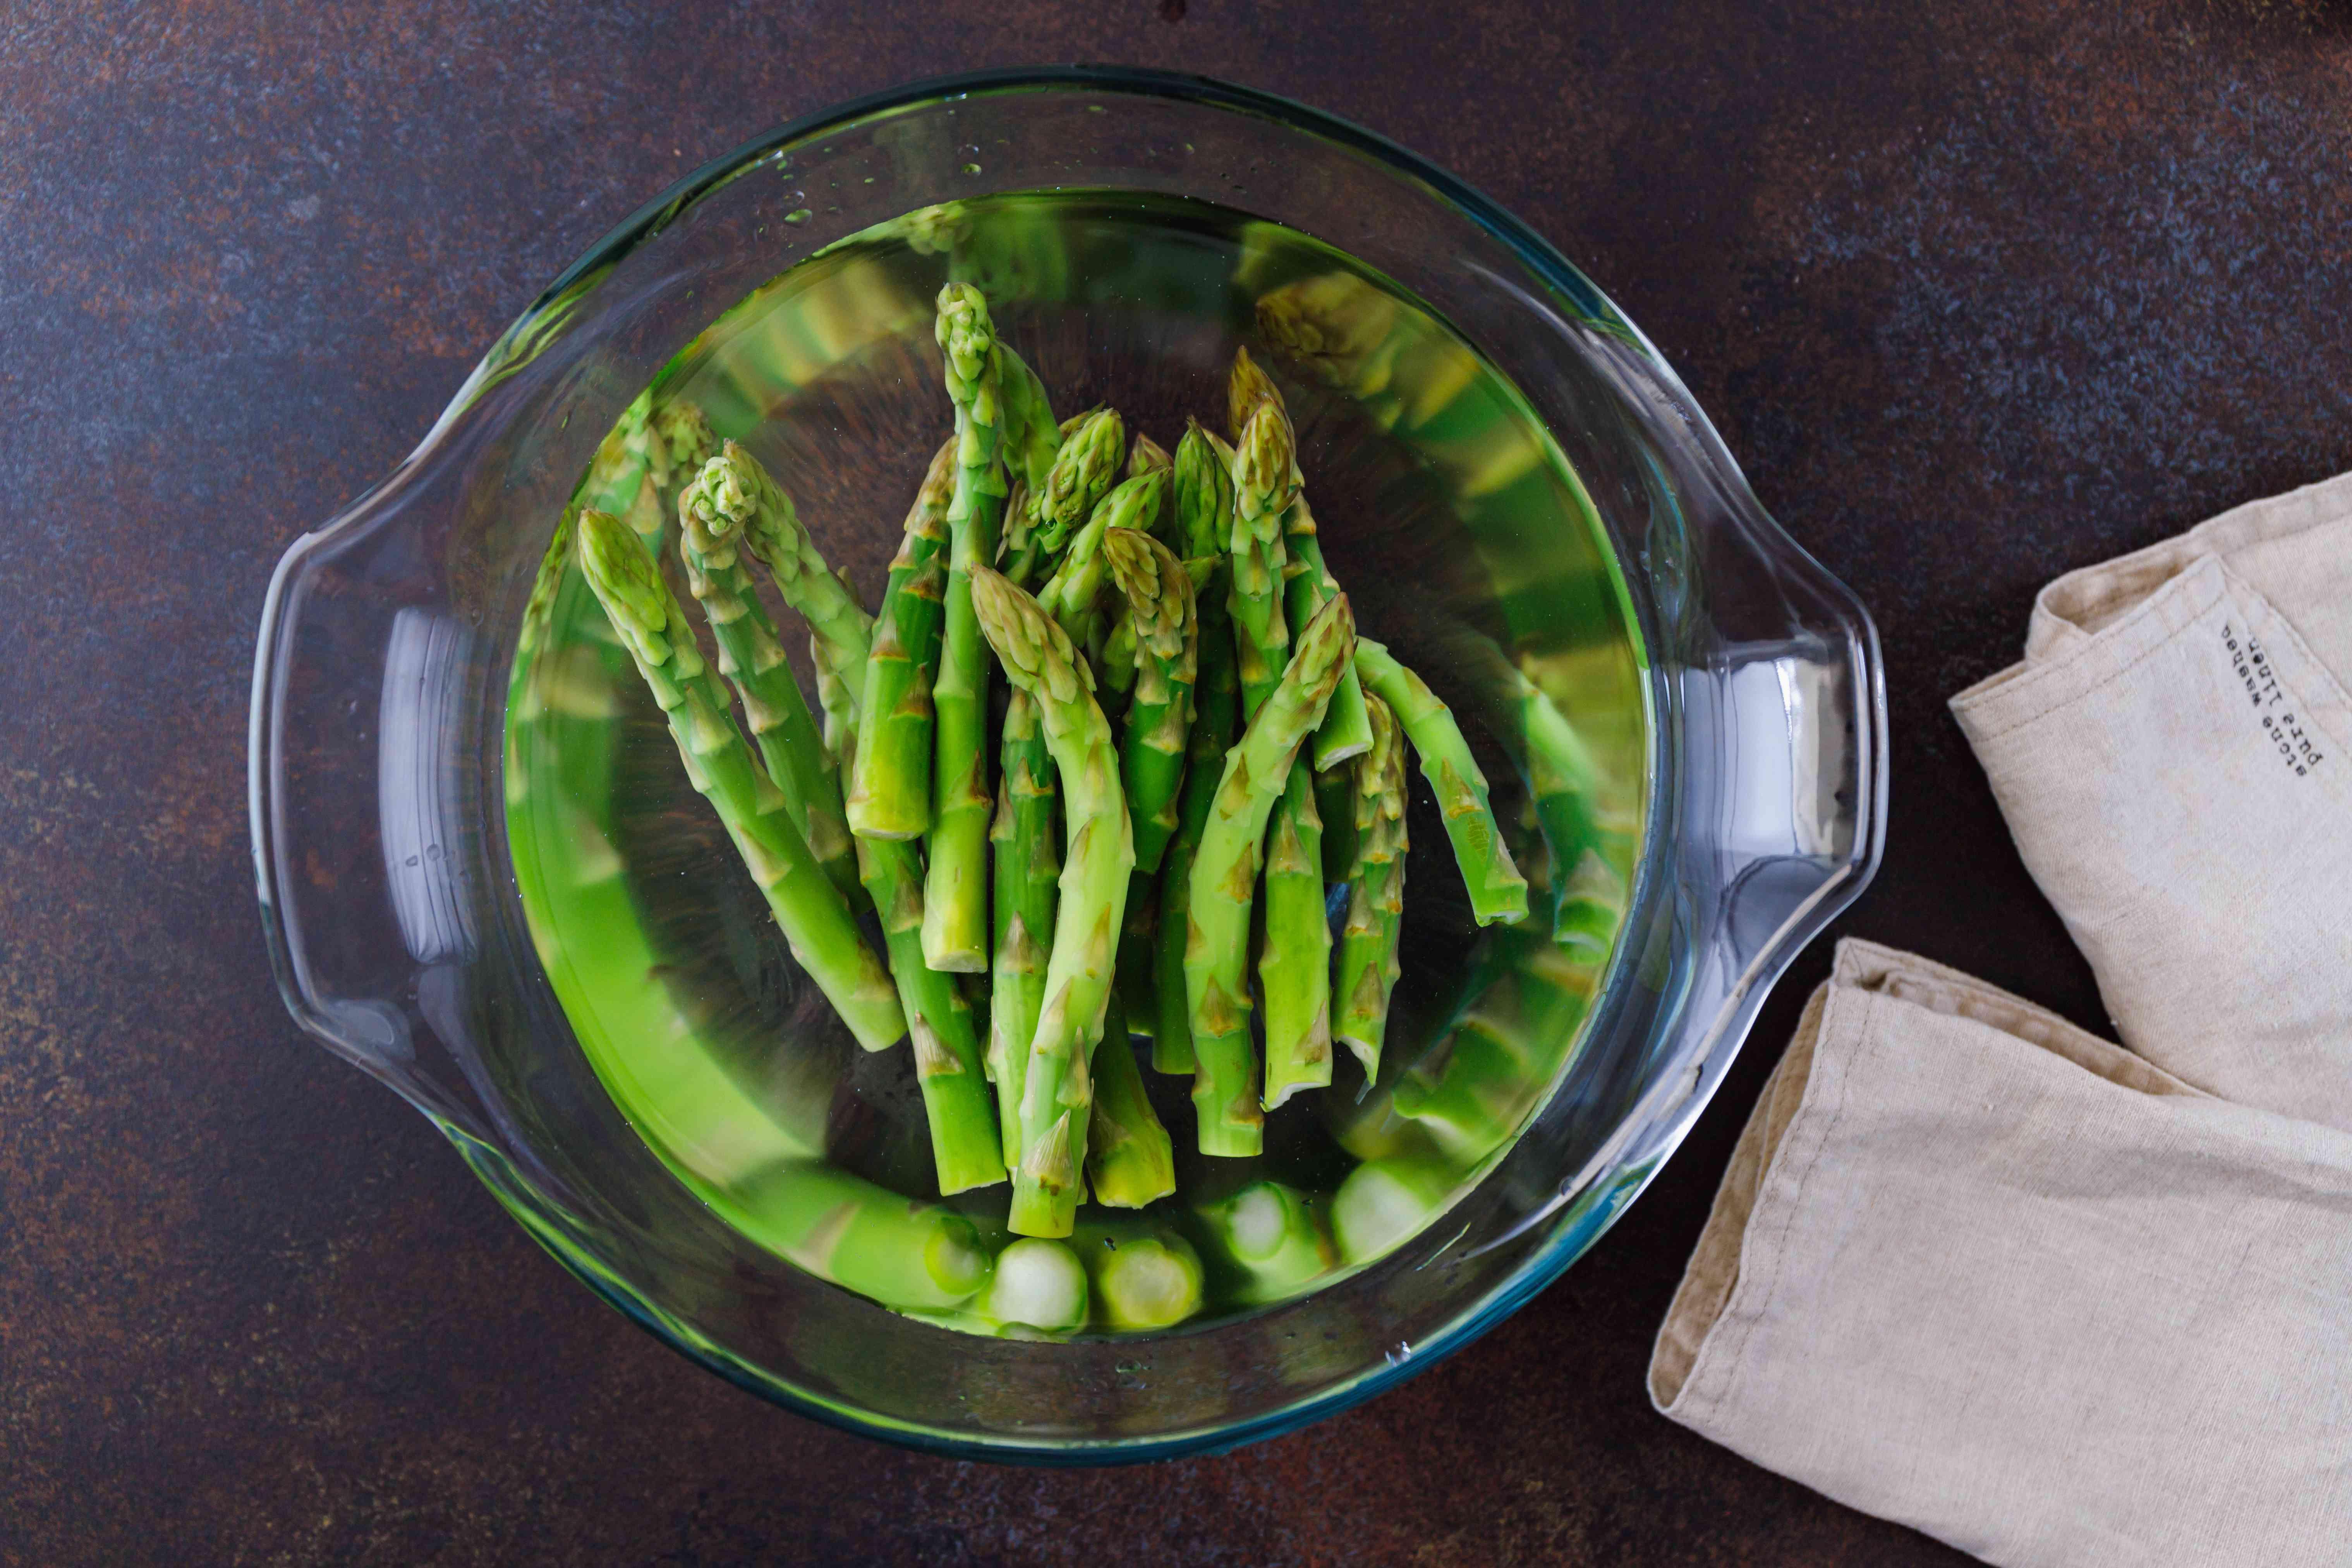 Drain the asparagus